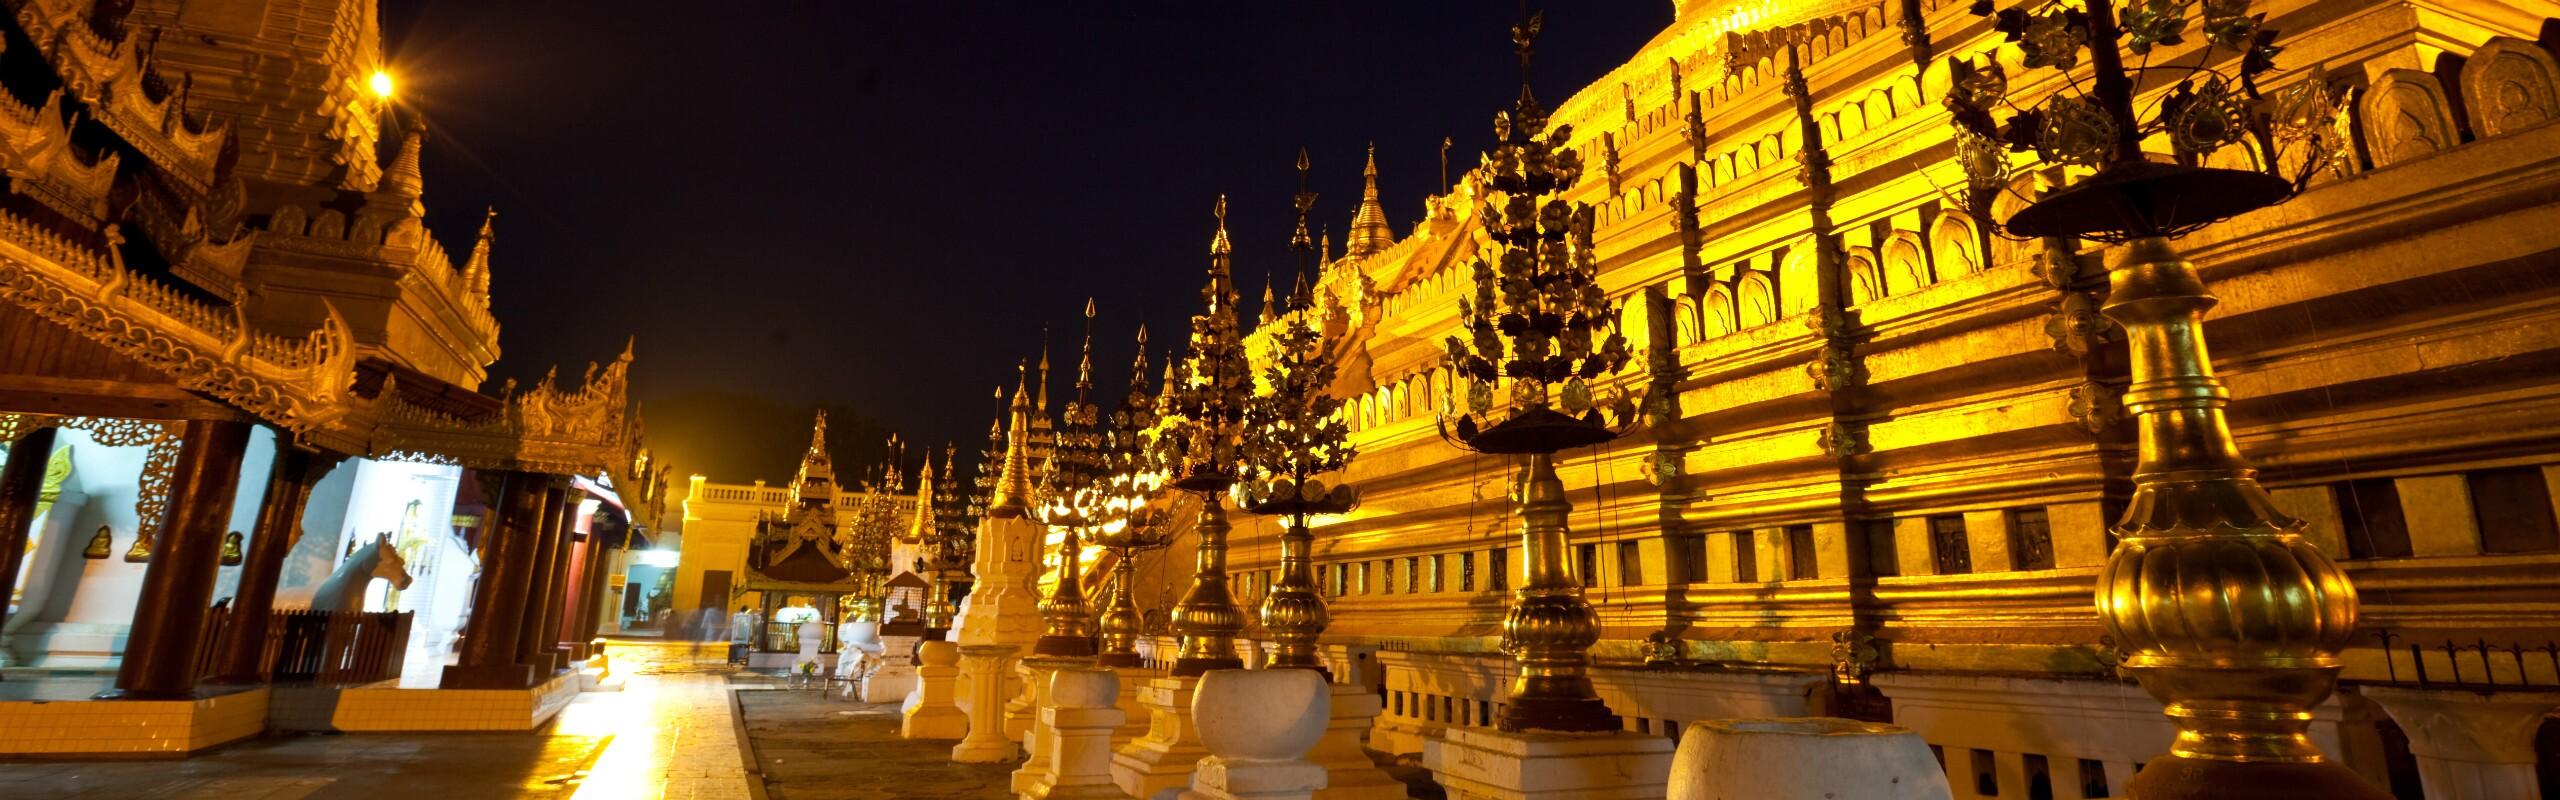 Plan a trip to Yangon - two days to enjoy the charms